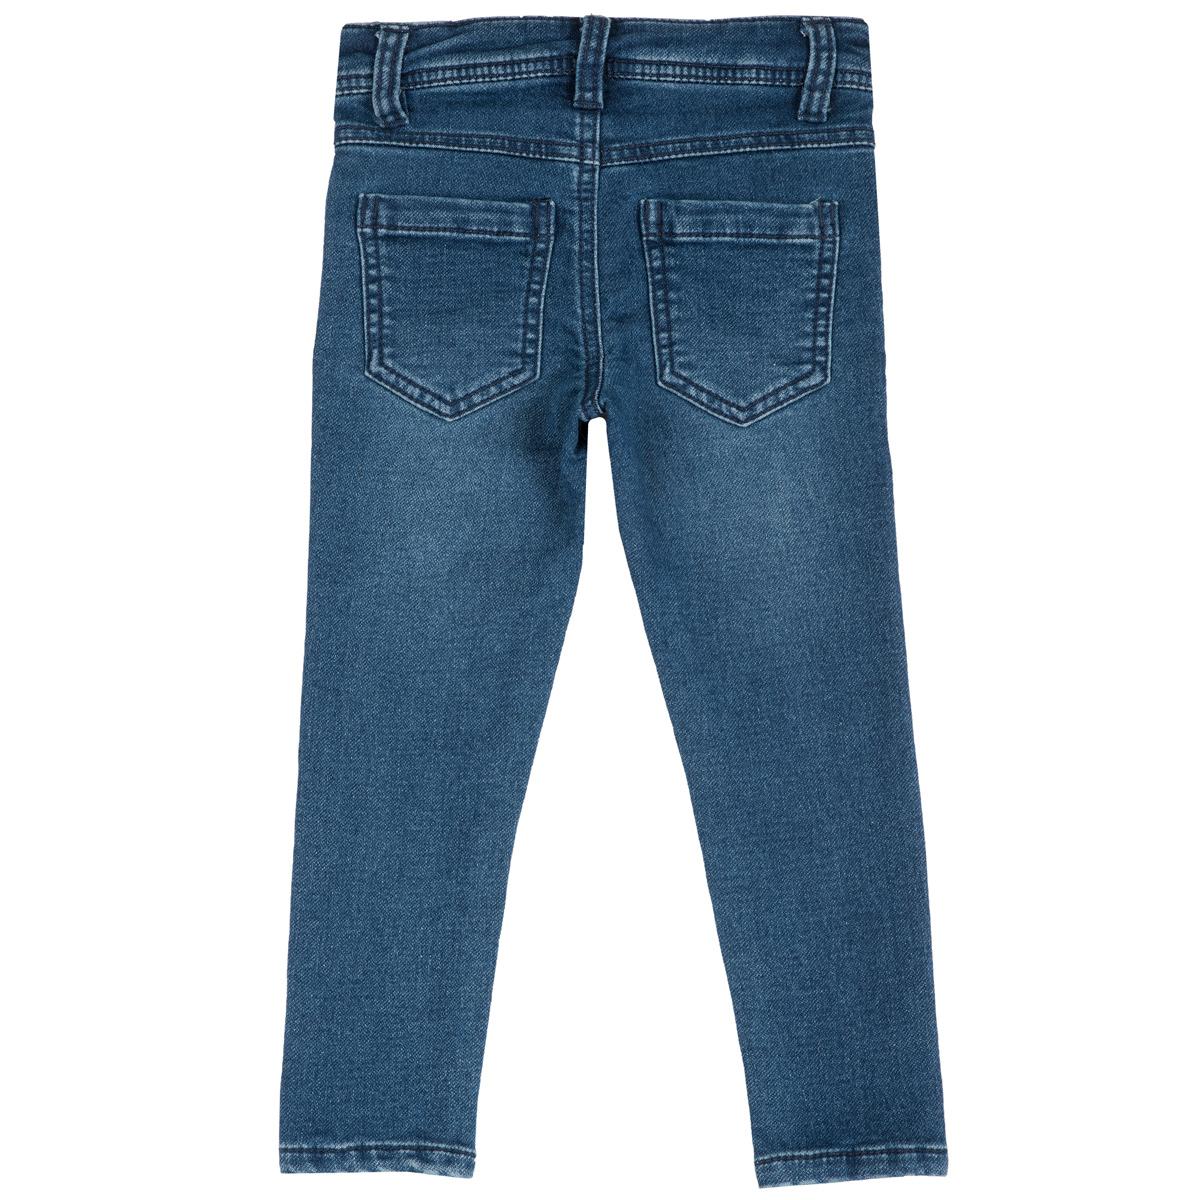 Pantaloni lungi copii Chicco, regular fit, denim, 08085 din categoria Pantaloni copii